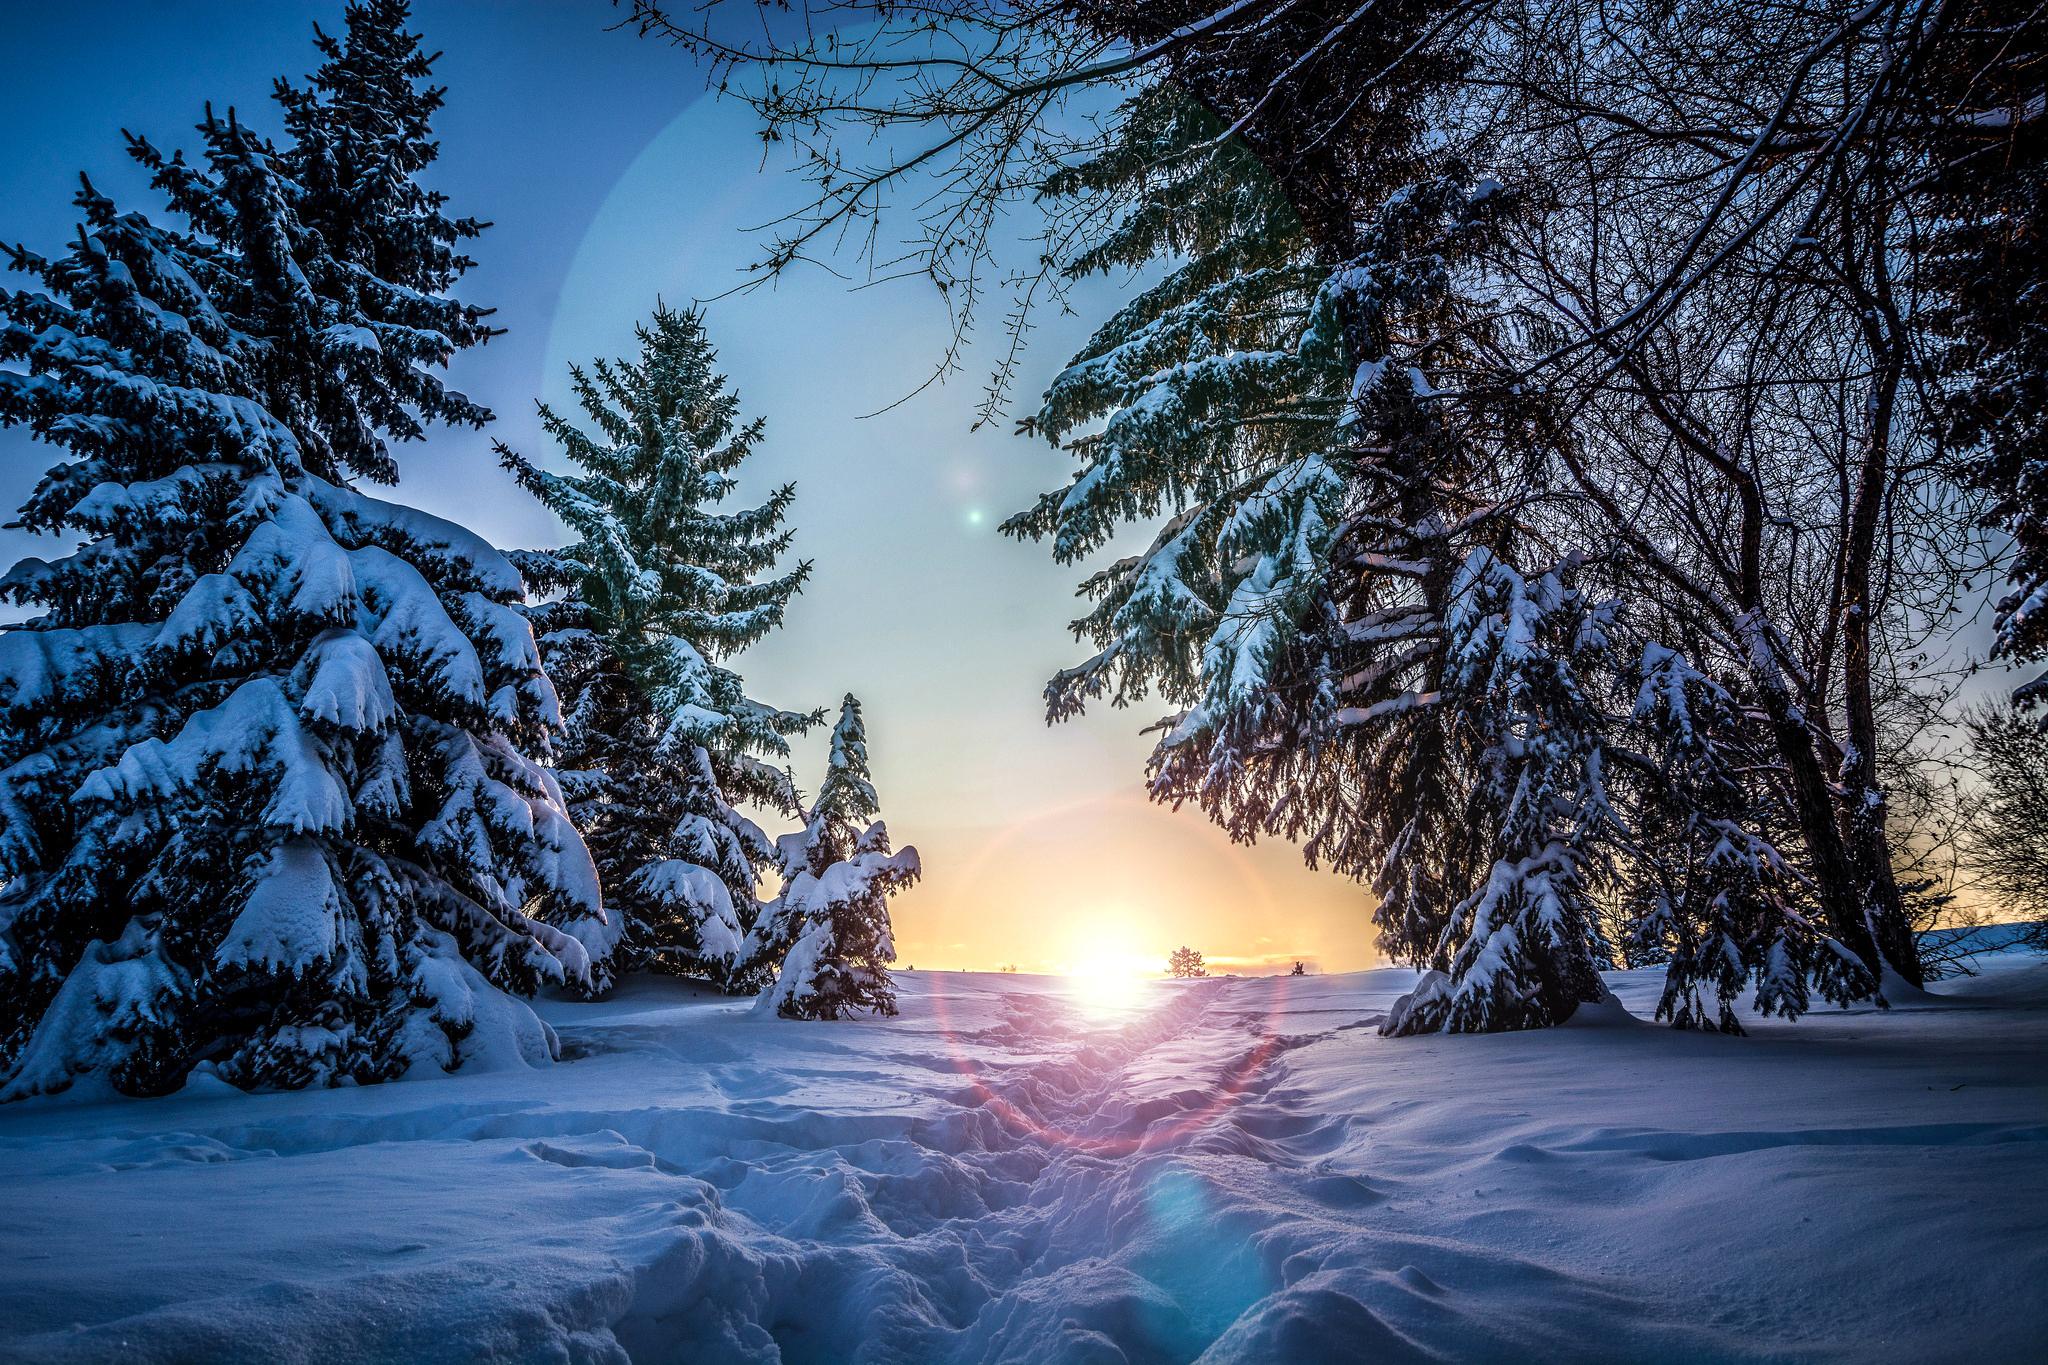 зима, снег, деревья